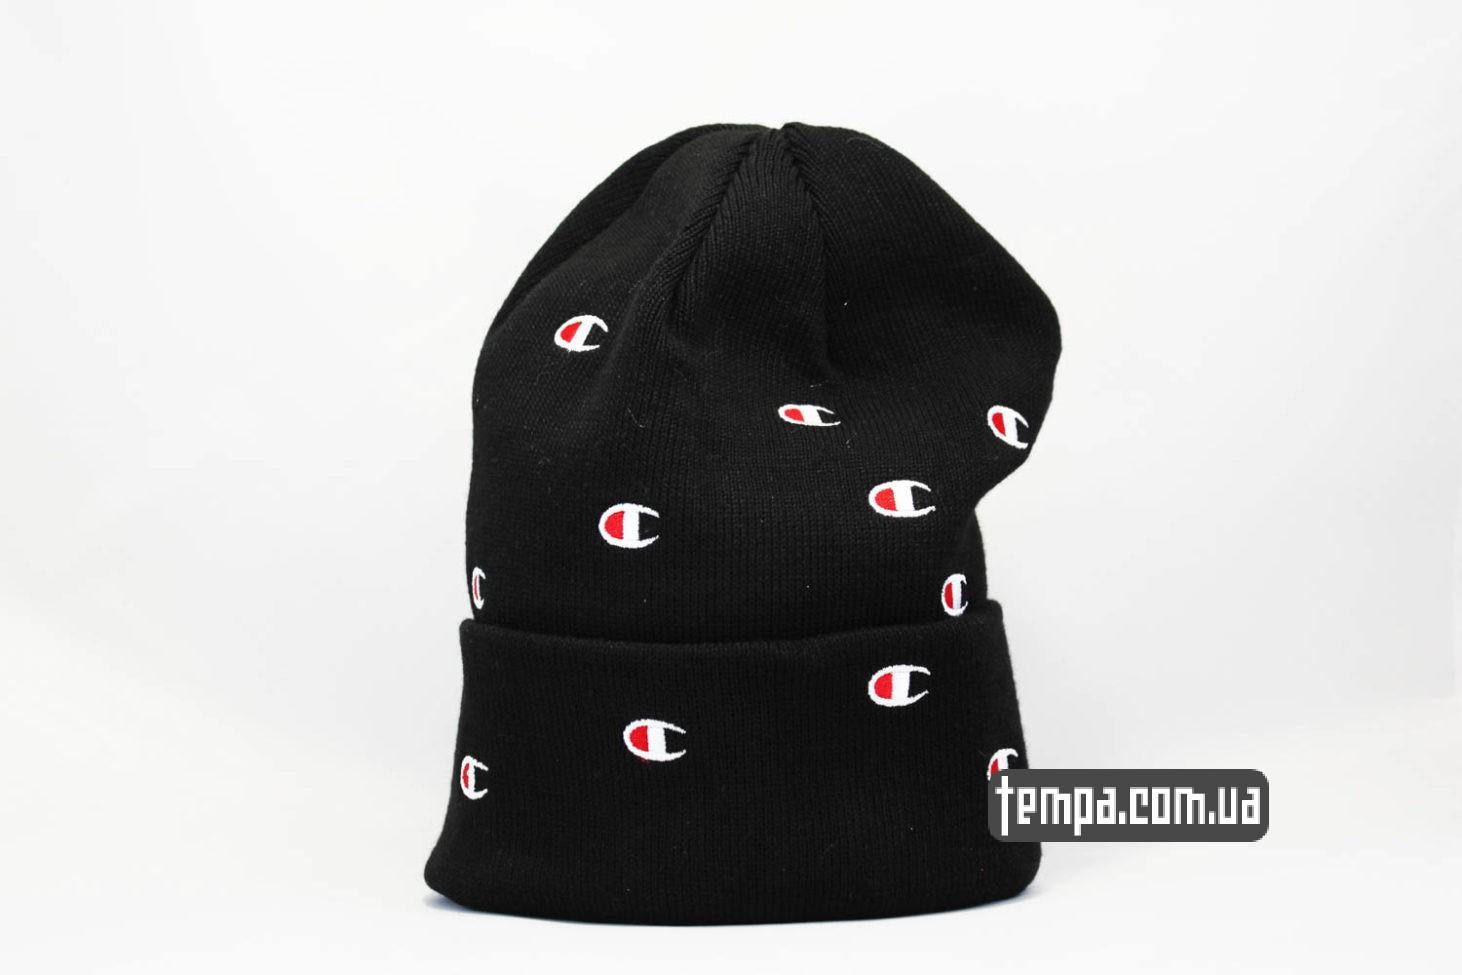 шапка beanie Champion black черная с логотипами